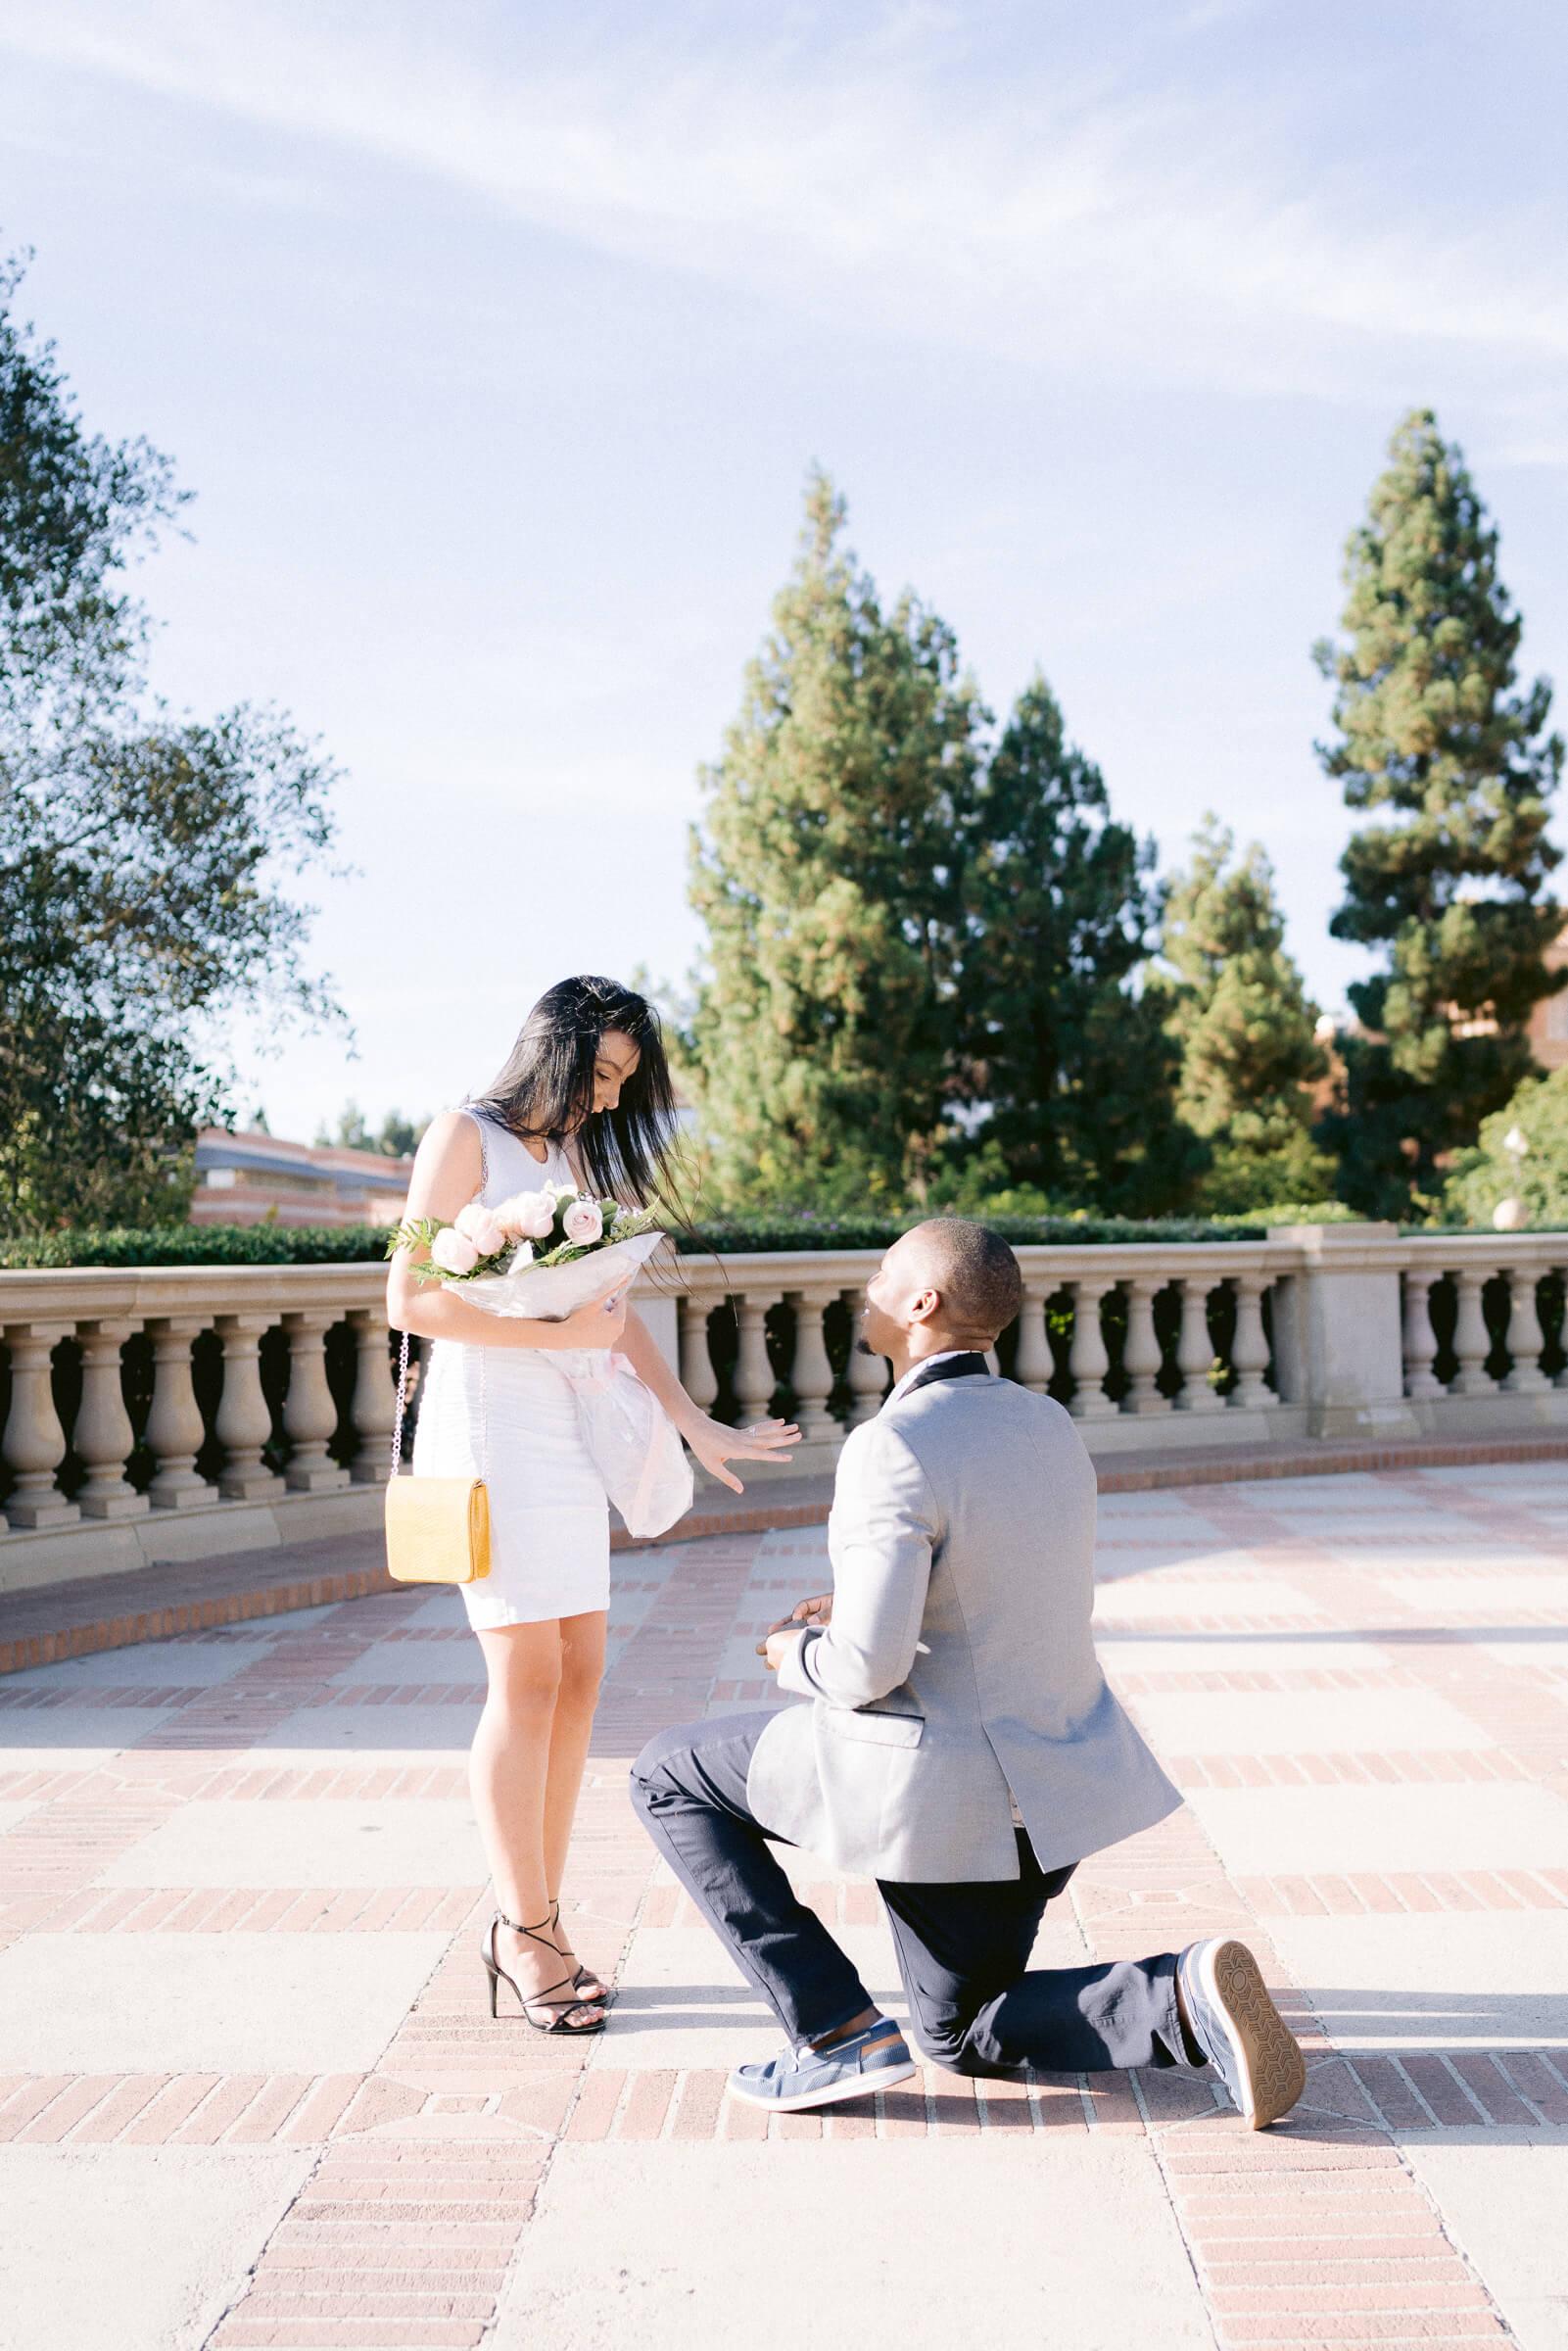 ucla-los-angeles-proposal-photographer-12.jpg